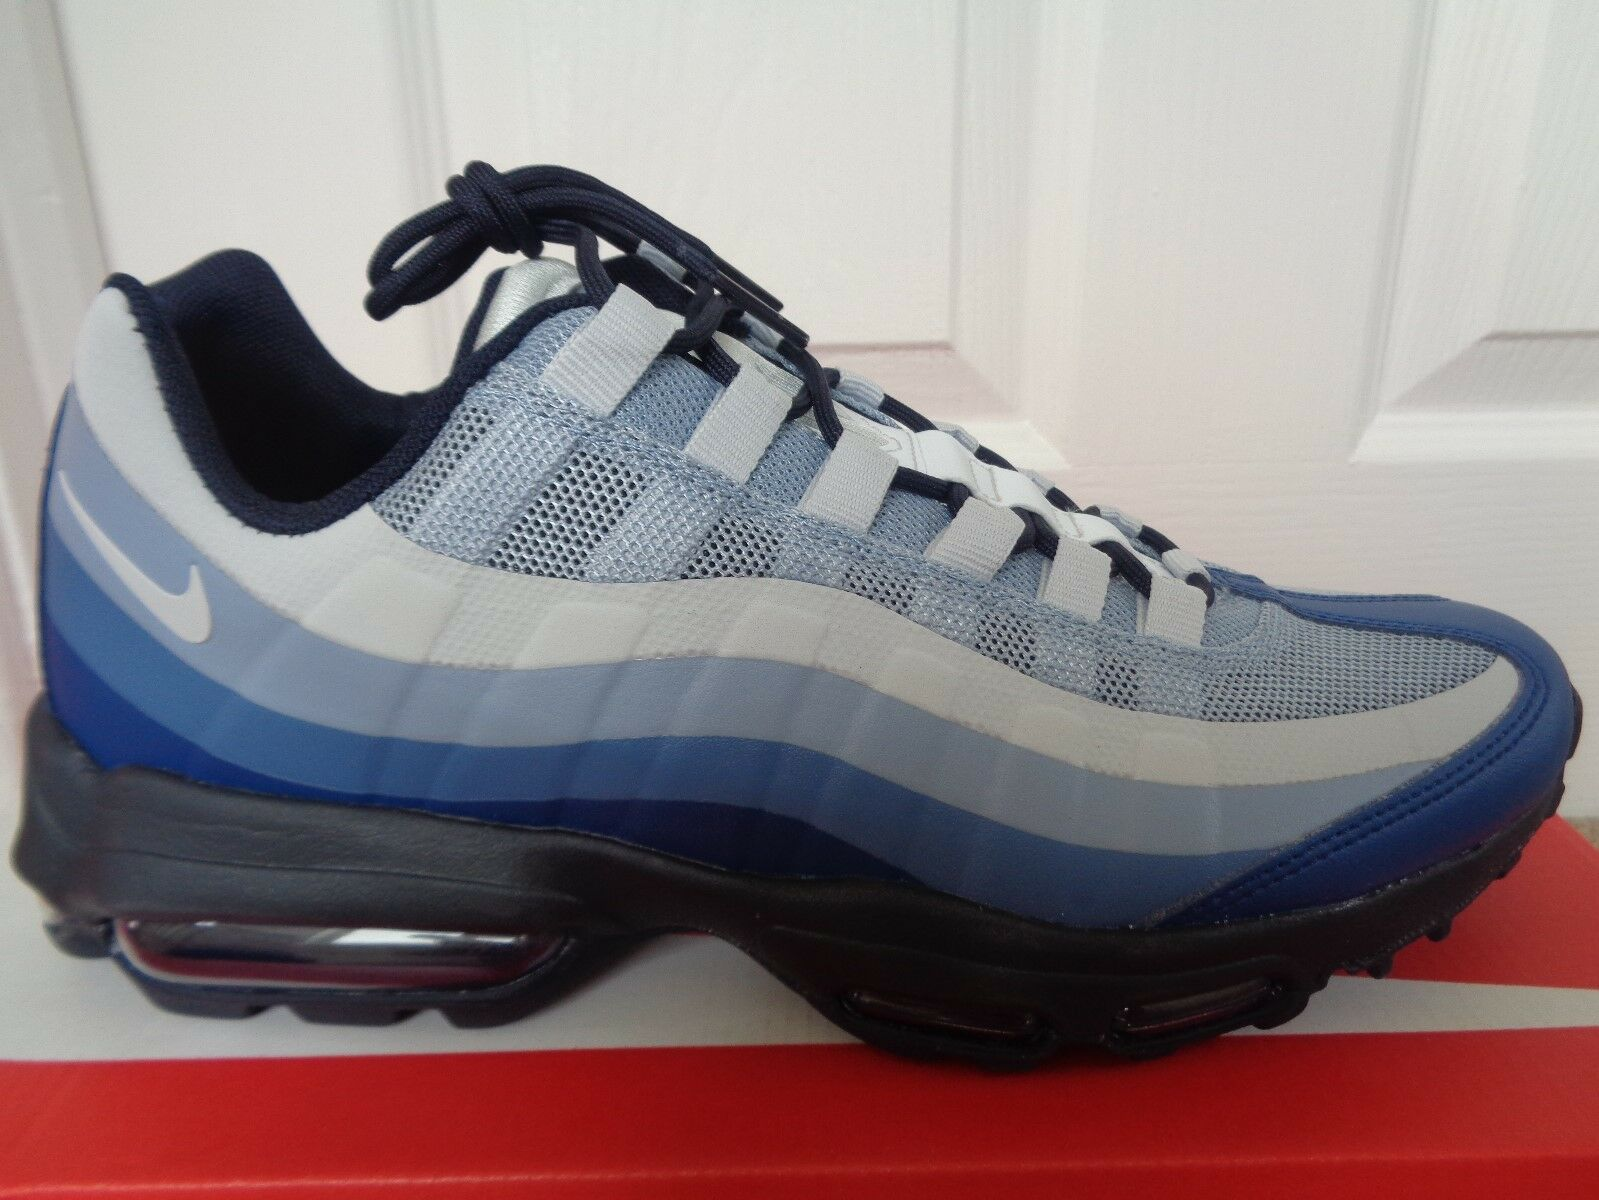 Nike Air max 95 ultra essential trainers shoe 857910 400 uk 7 eu 41 us 8 NEW+BOX